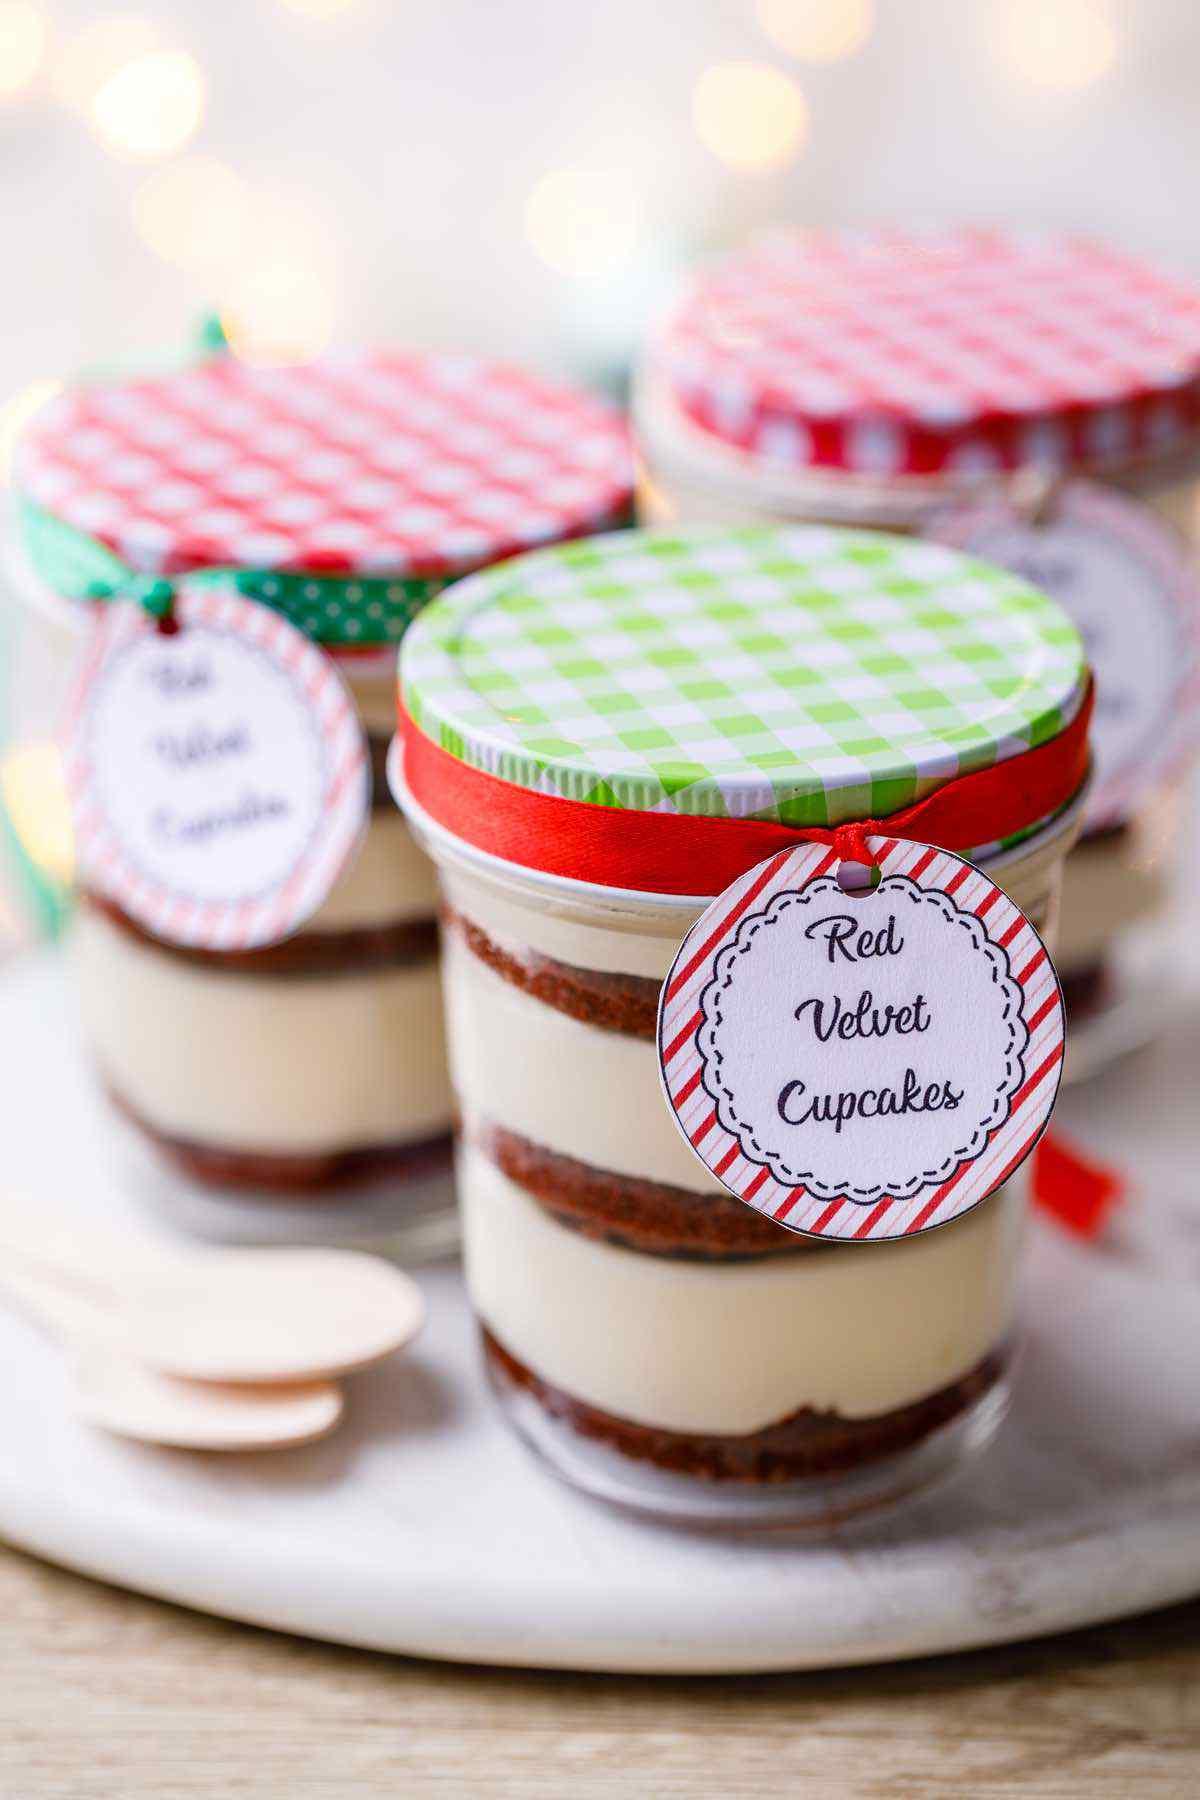 Red Velvet Cupcakes in a Jar